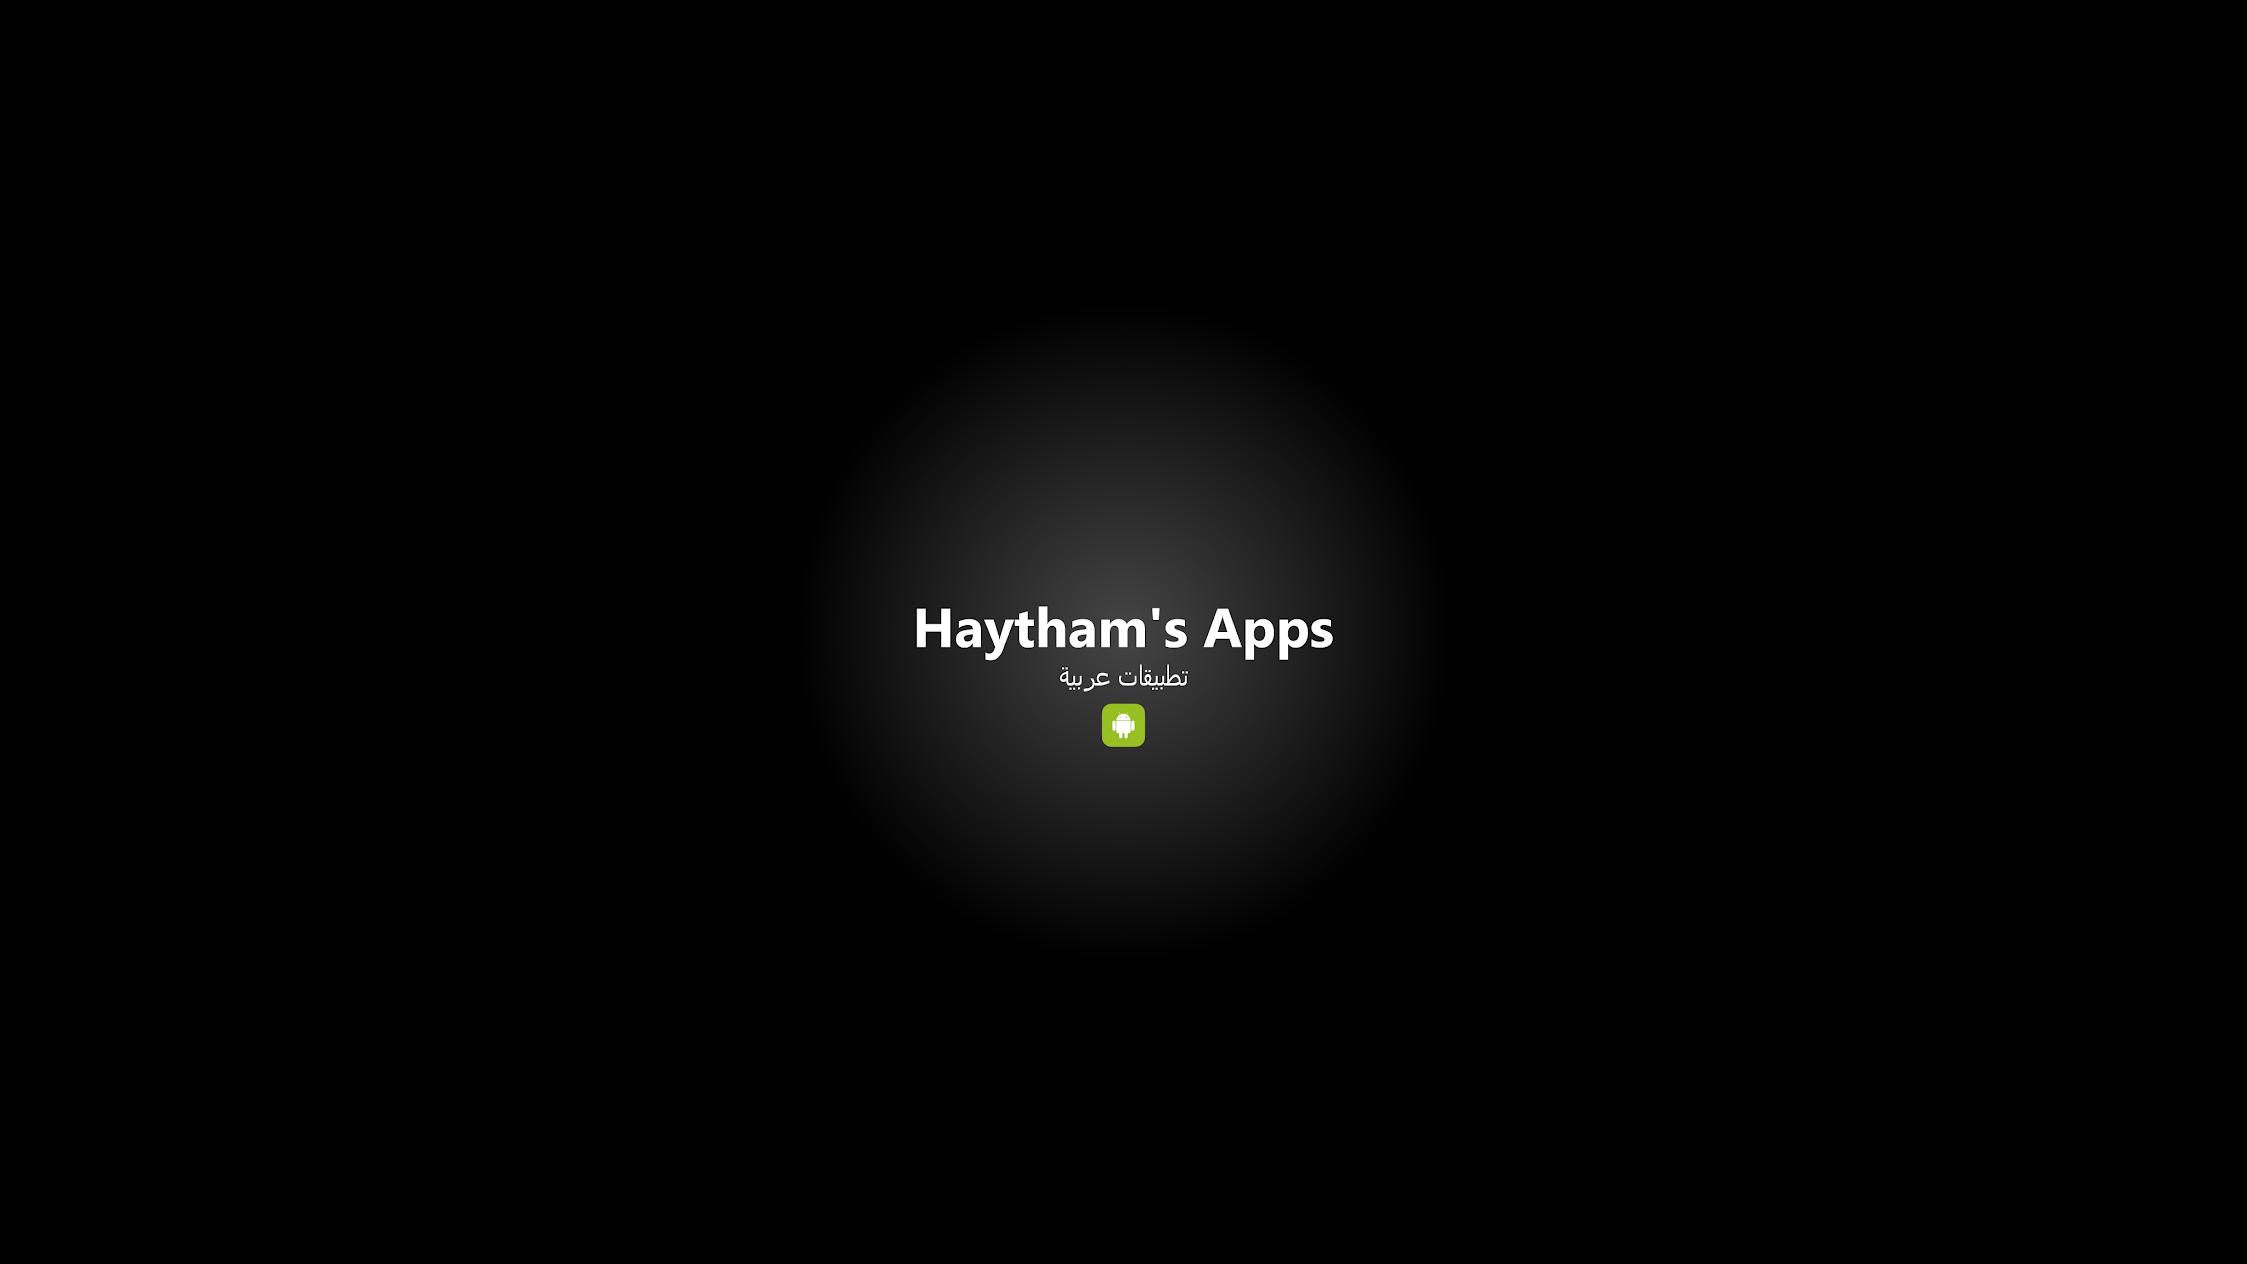 Haytham G. Zeidan